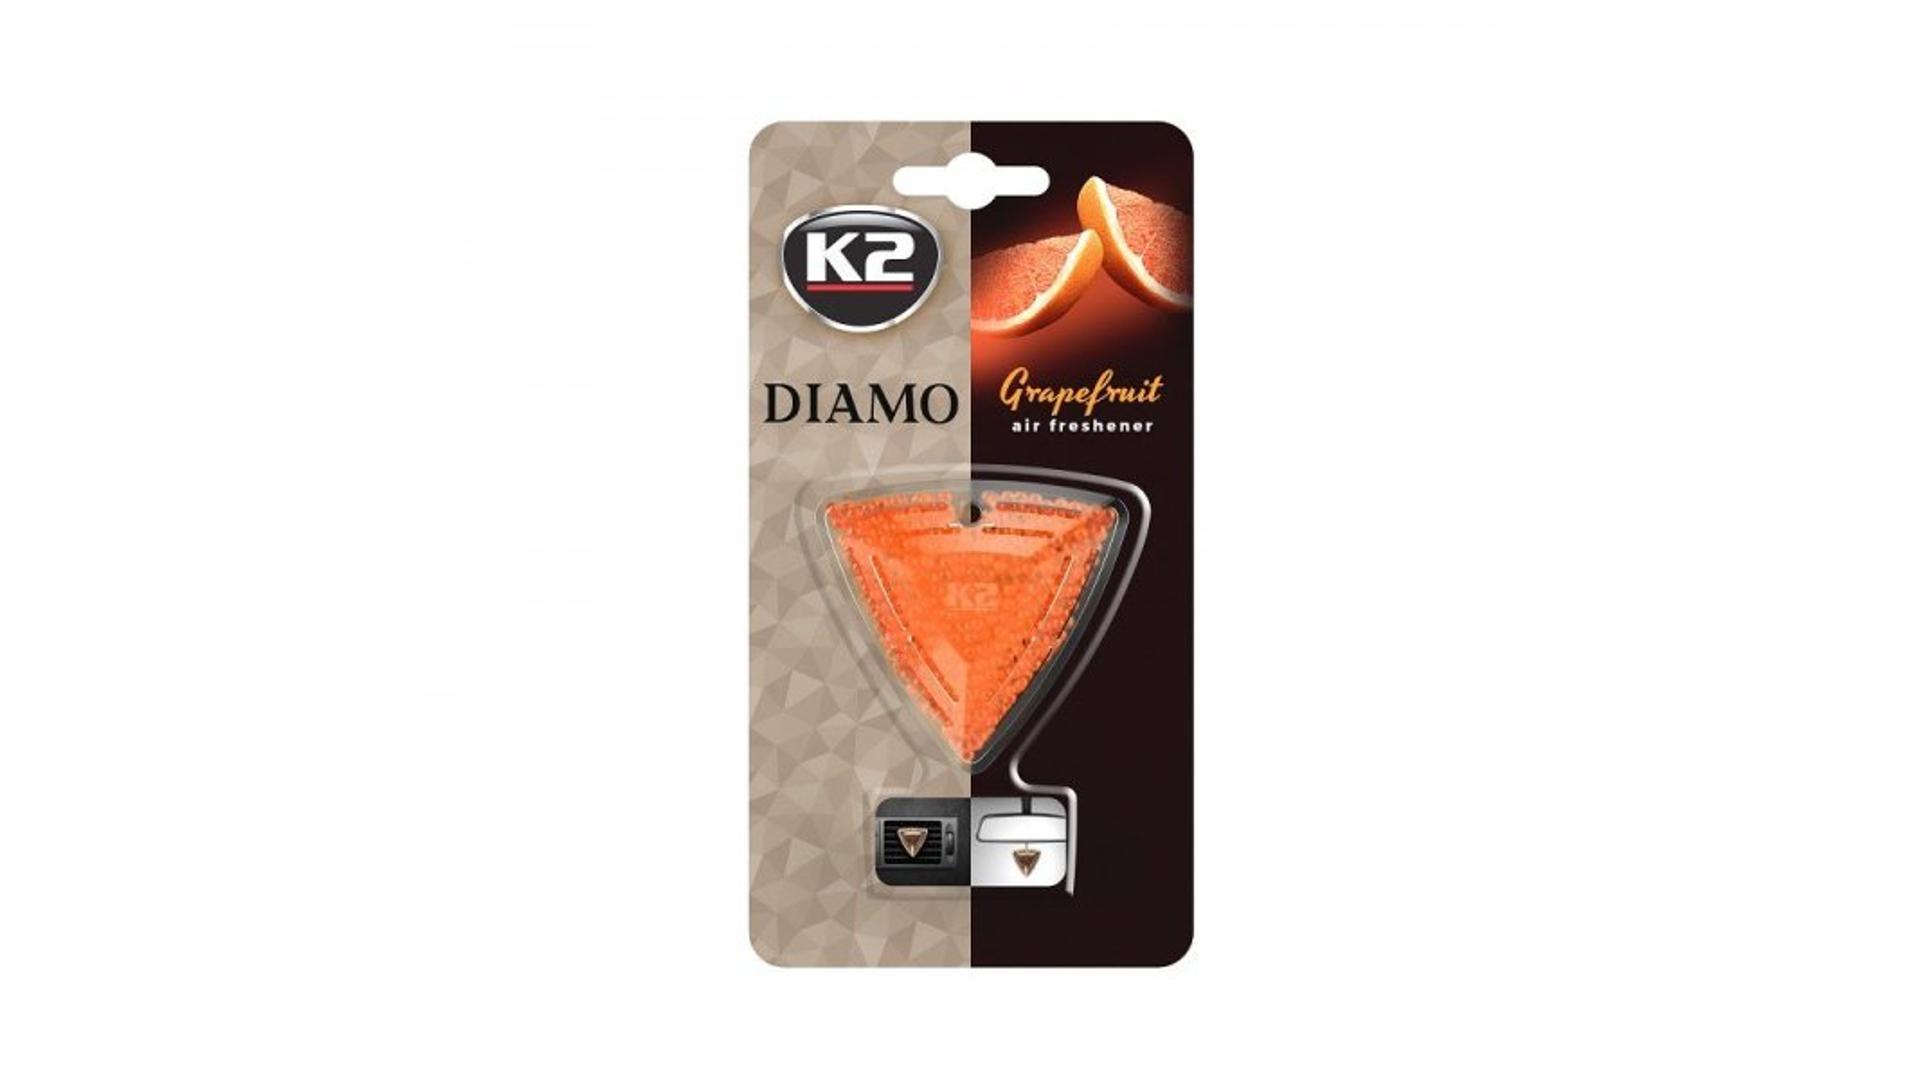 K2 DIAMO GRAPEFRUIT